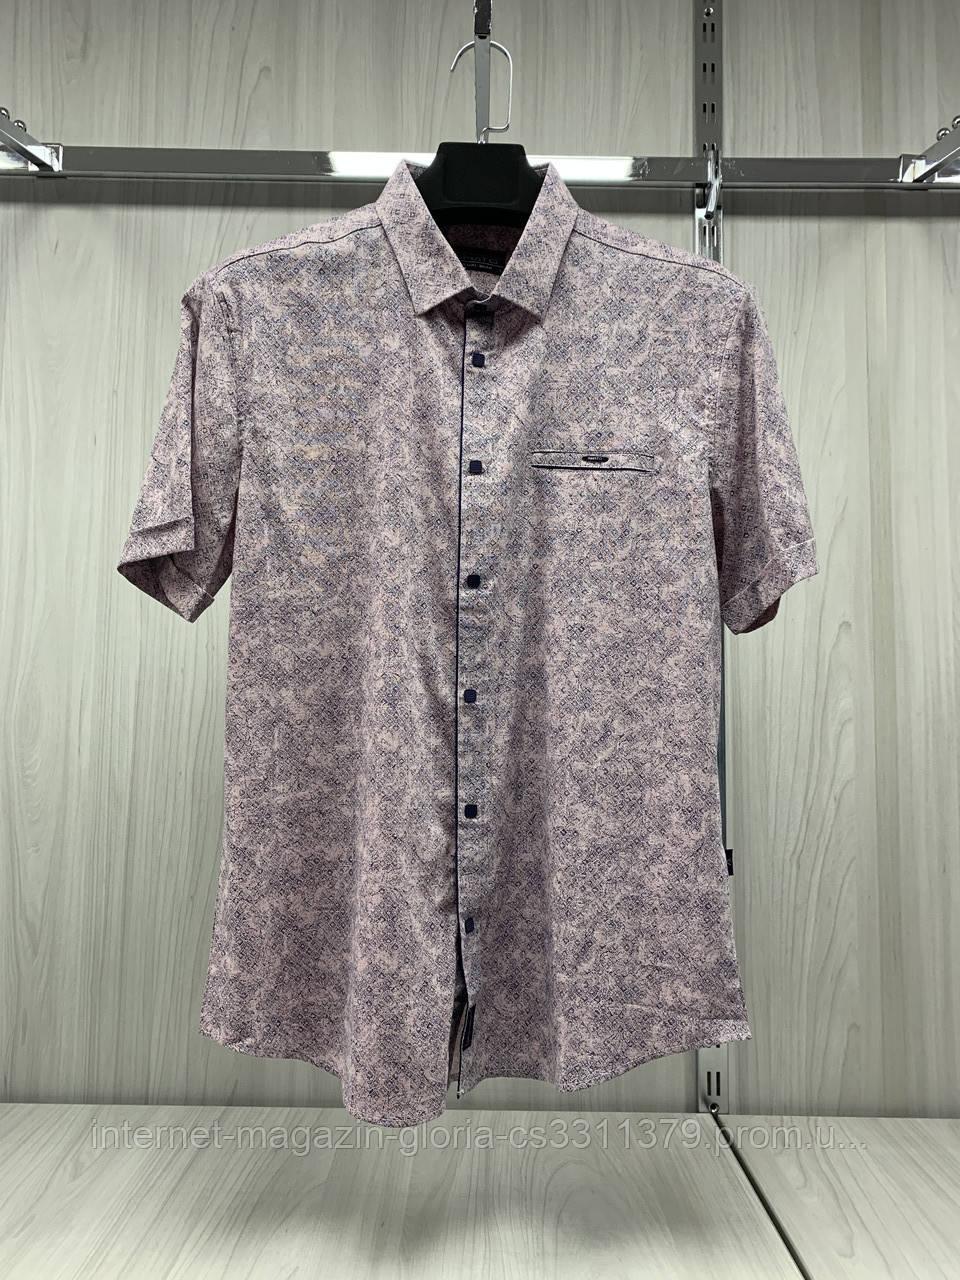 Мужская рубашка Amato. AG.KG19839-2-v06. Размеры: L,XL,XXL.